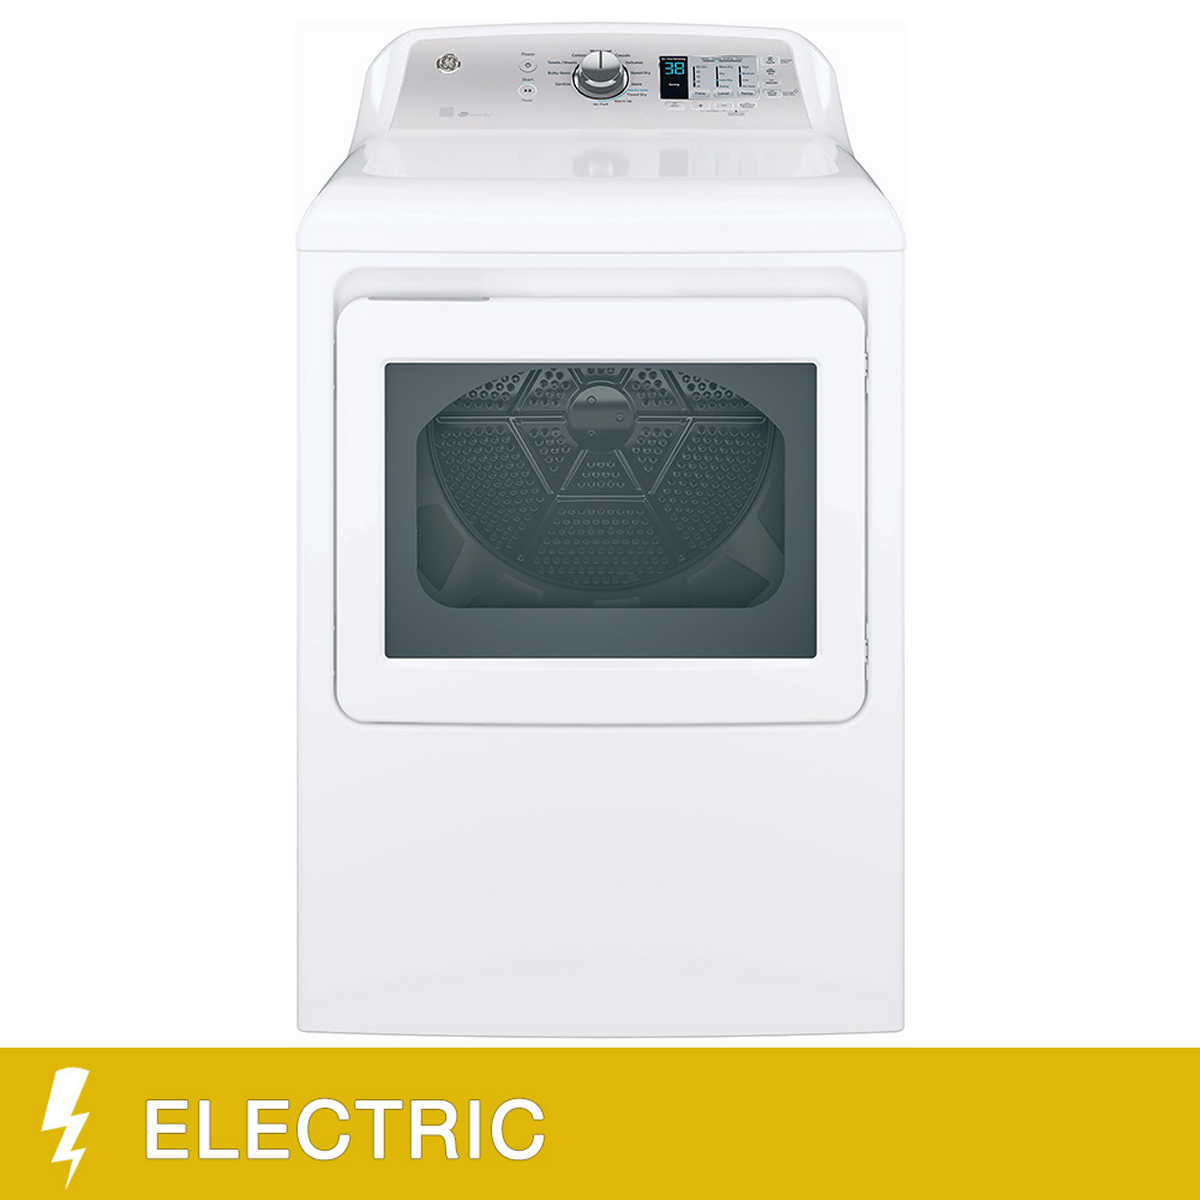 Appliances Dryers Electric Dryers Costco